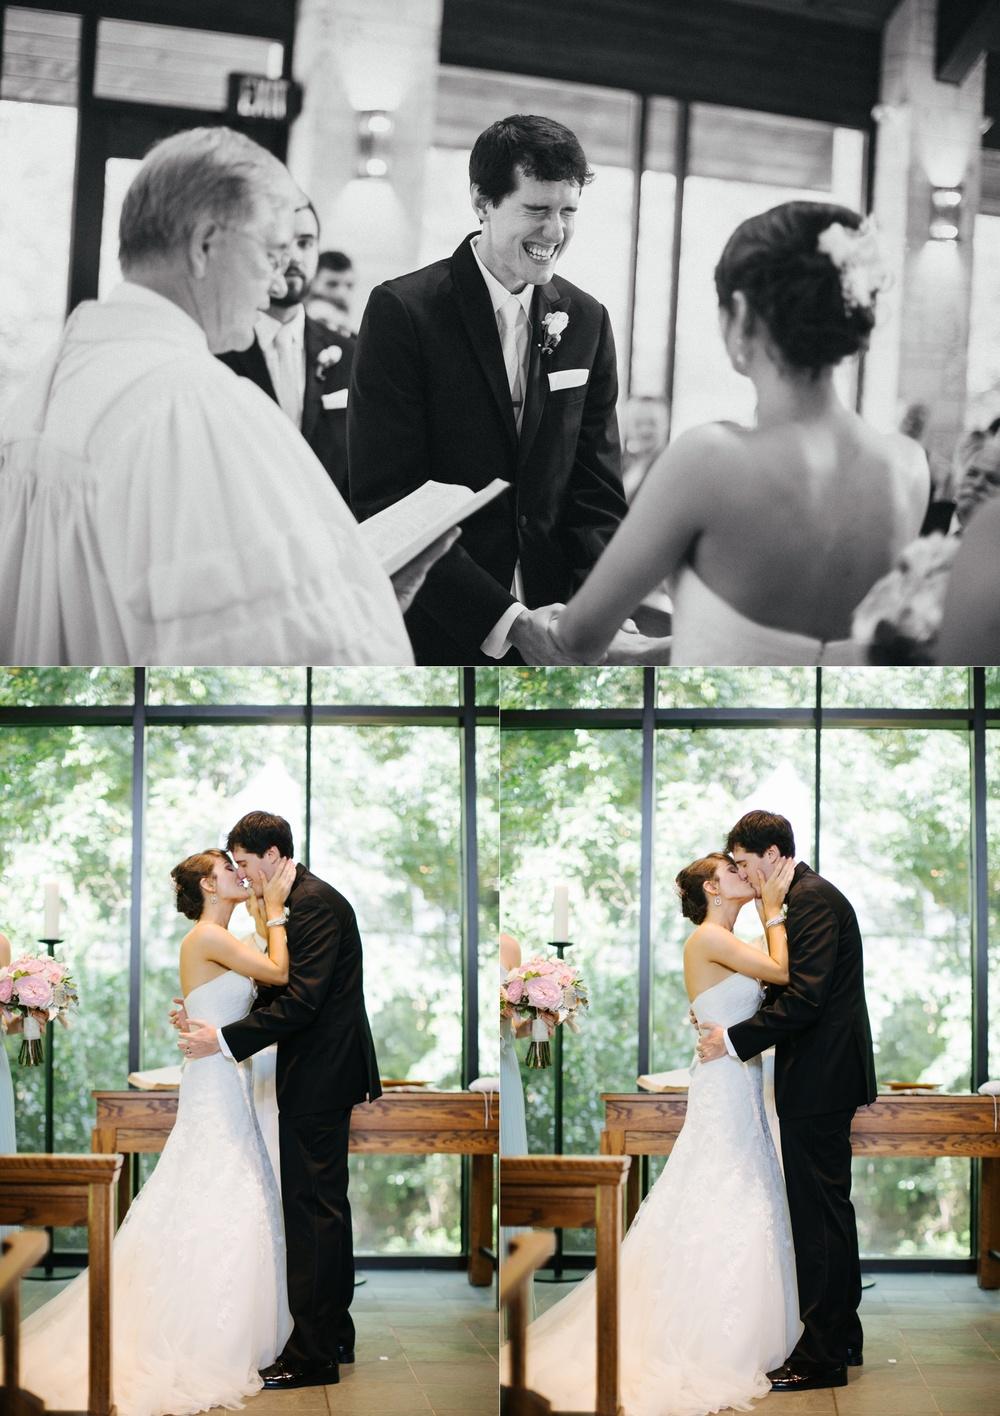 jake-and-katie-wedding-favorites-2015-32